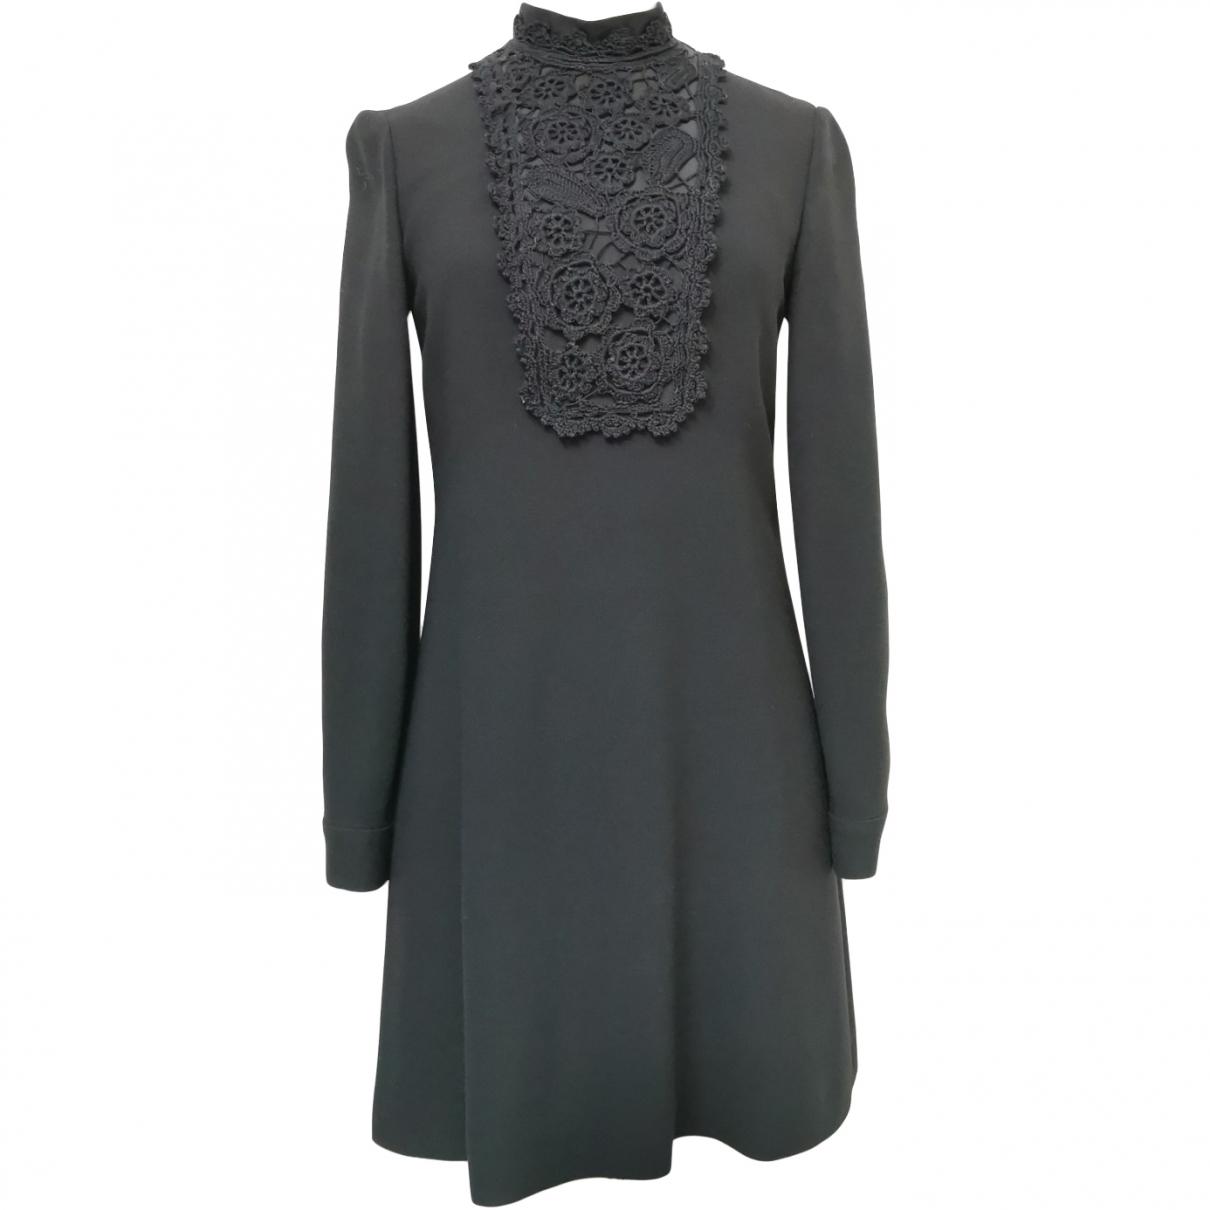 Prada \N Black Wool dress for Women 42 IT